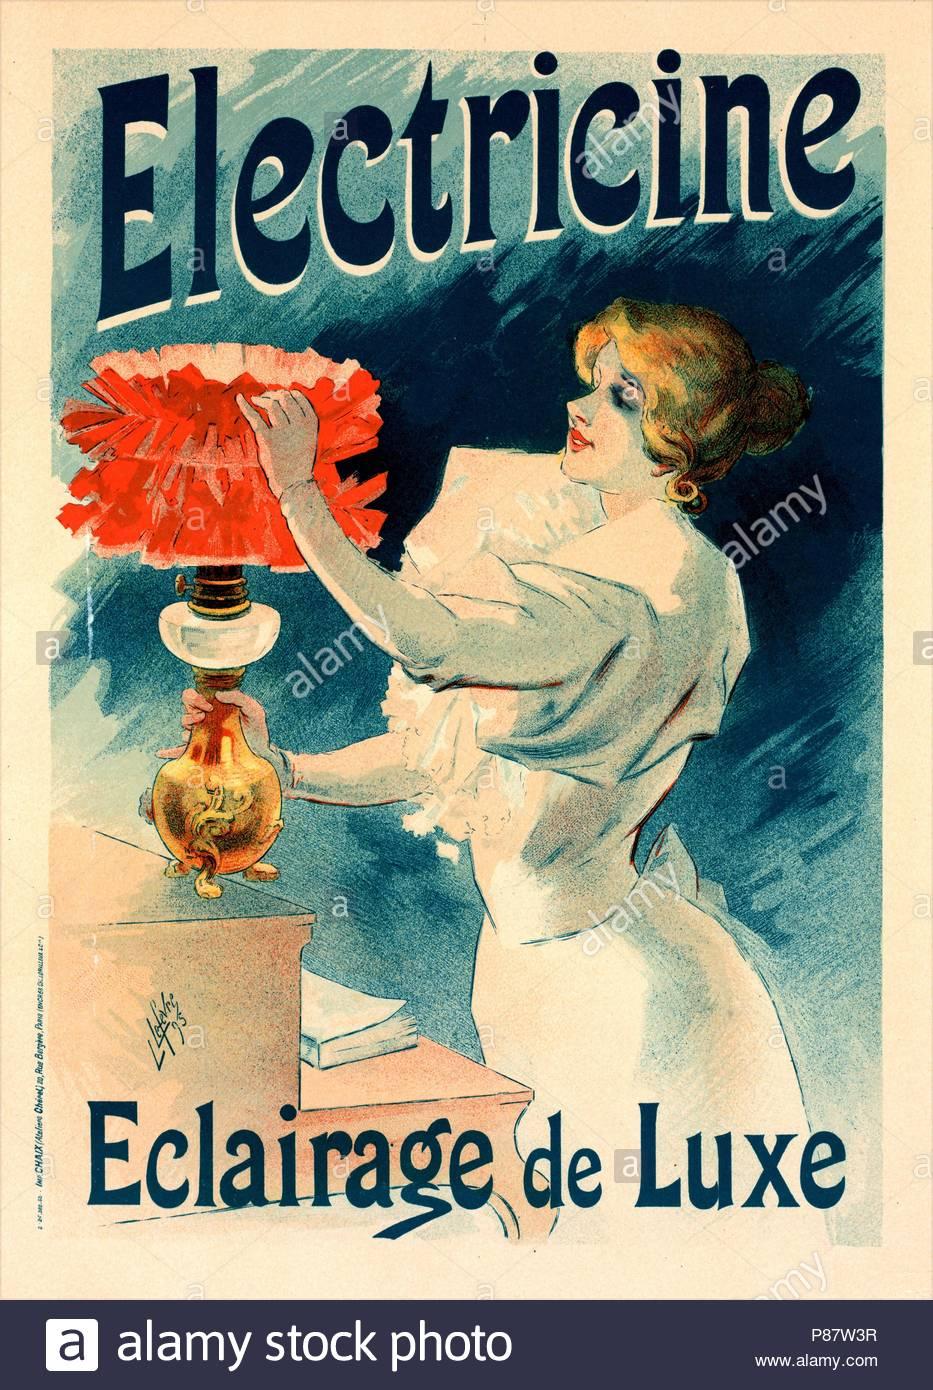 Plakat Für Lélectricine Lucien Lefevre 1850 Frankreich Im Salon